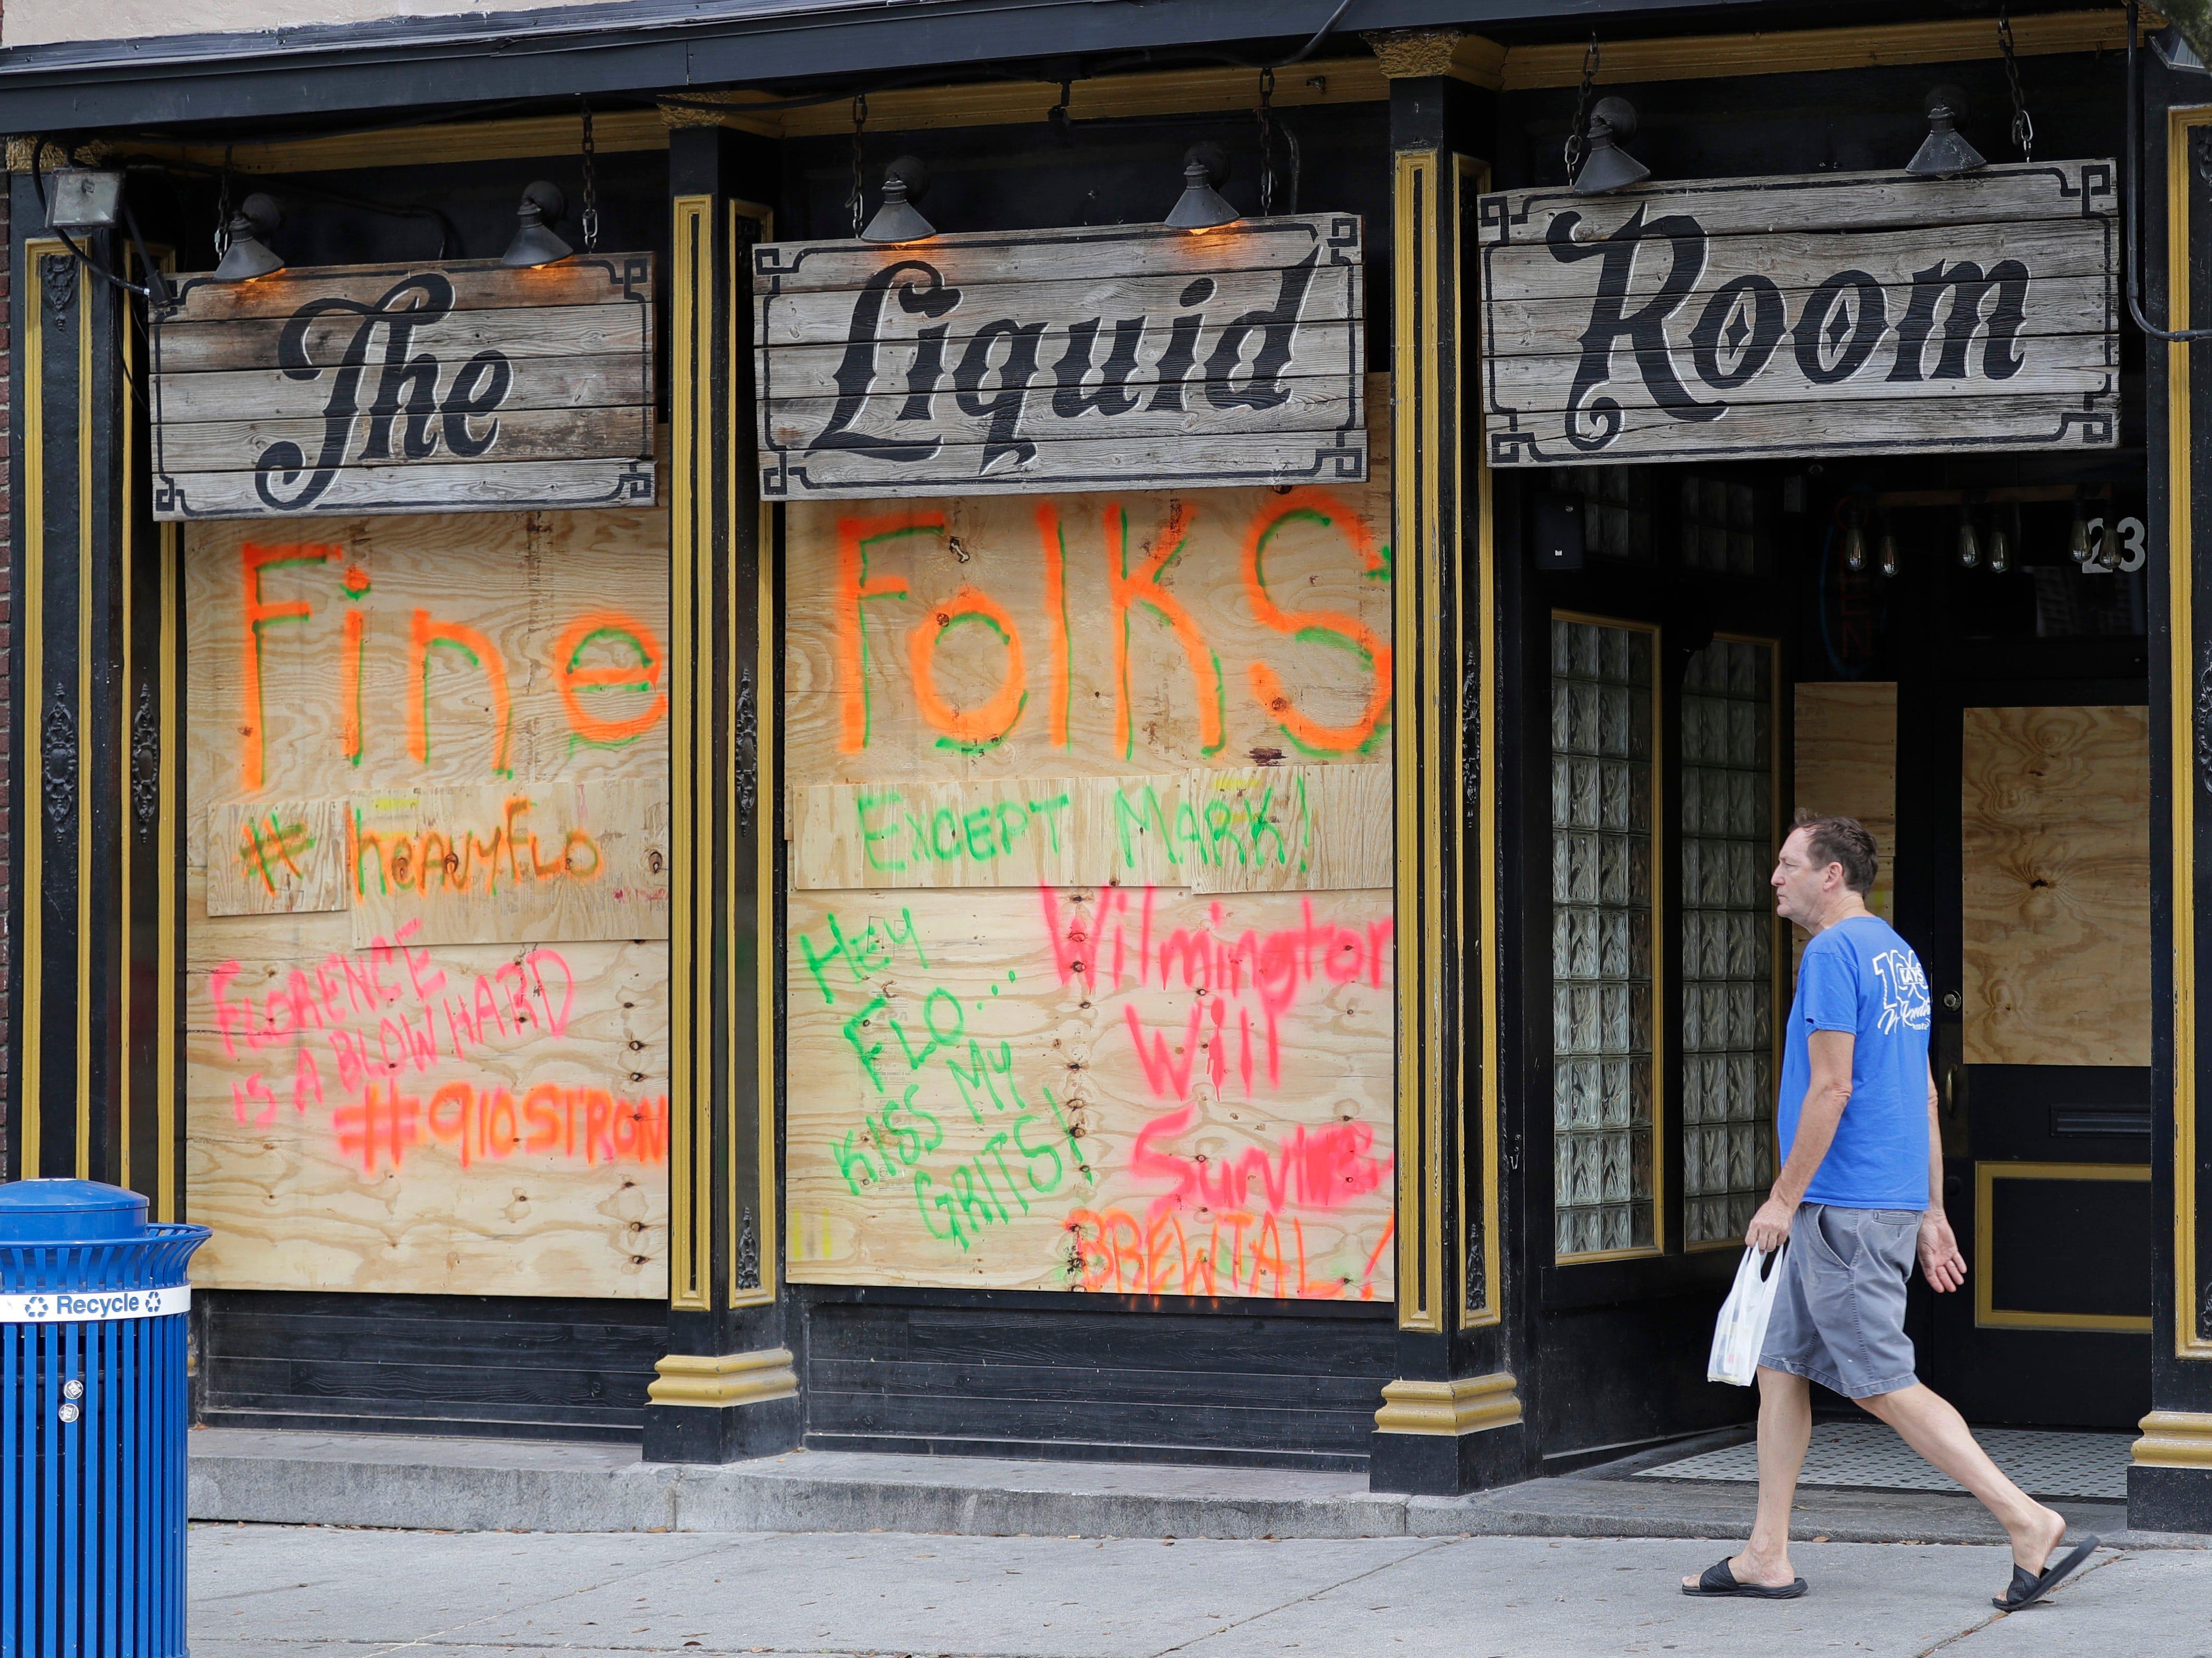 A man walks past a closed bar in downtown Wilmington, N.C., as Hurricane Florence threatens the coast Thursday, Sept. 13, 2018. (AP Photo/Chuck Burton)